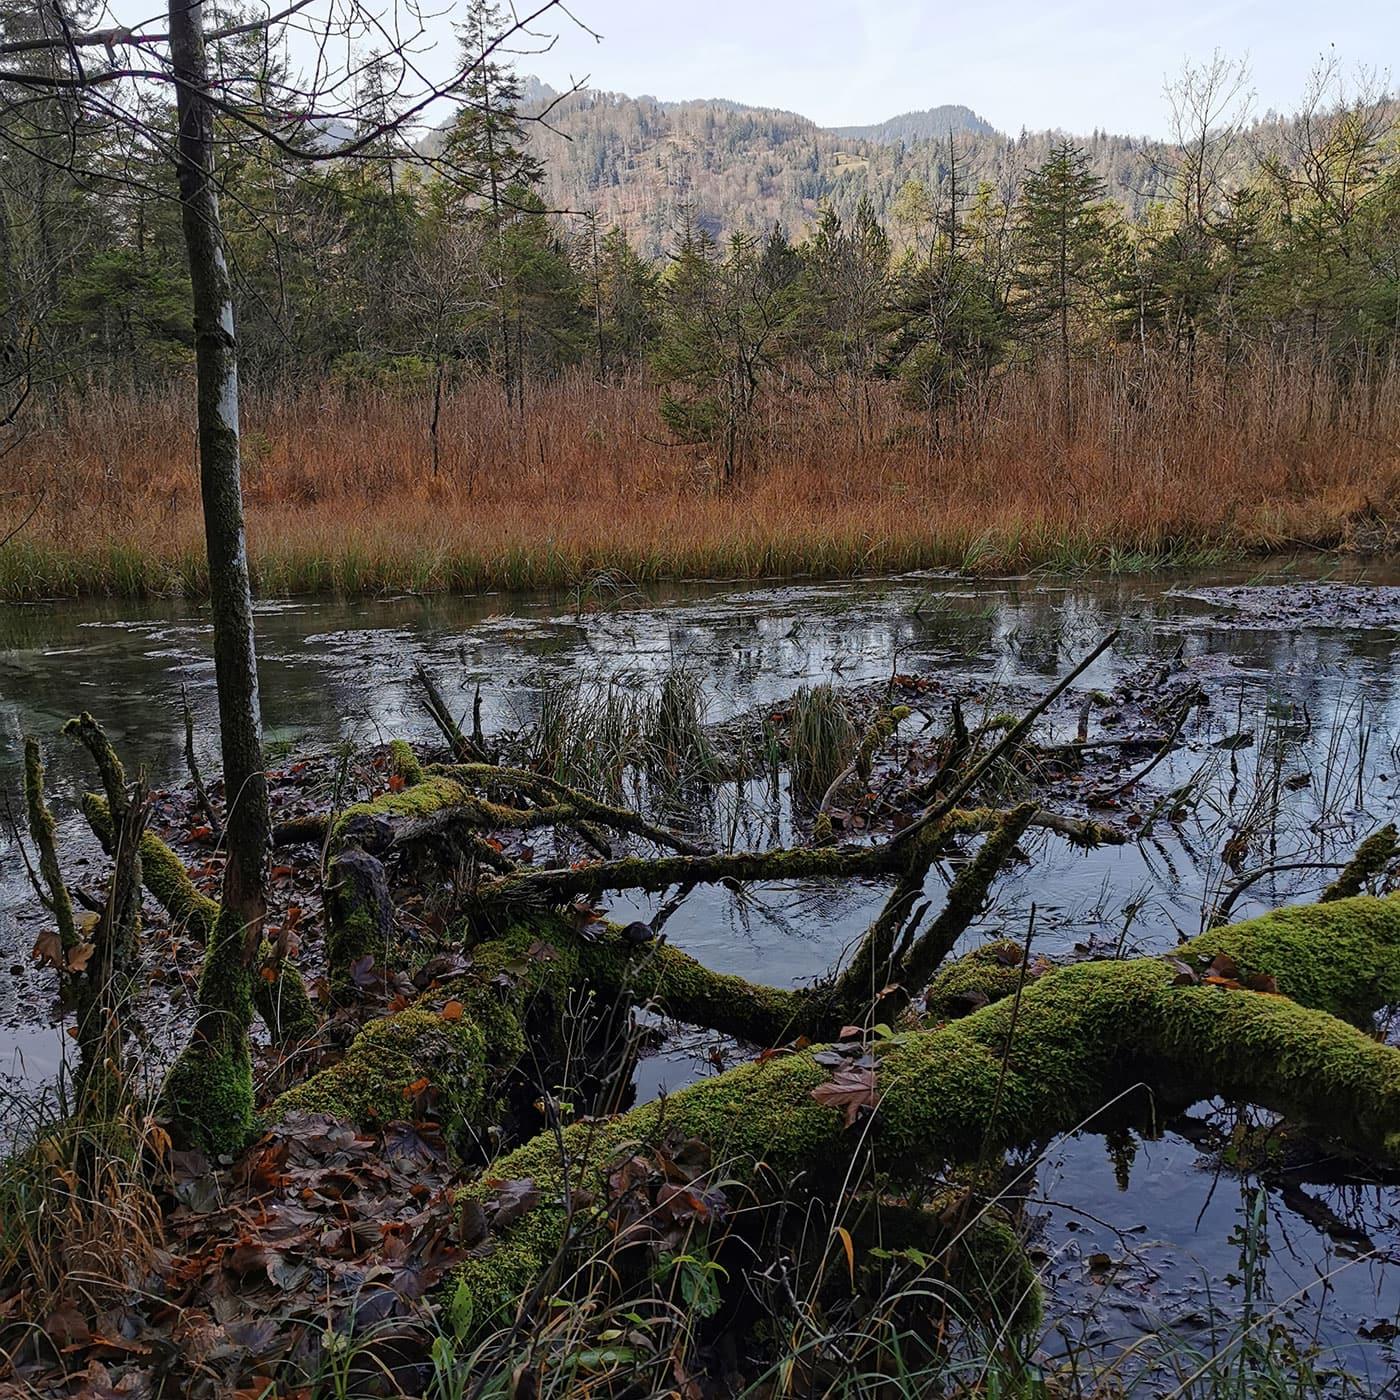 Sieben-Quellen-Sagenspaziergang: Sumpfgebiet // HIMBEER